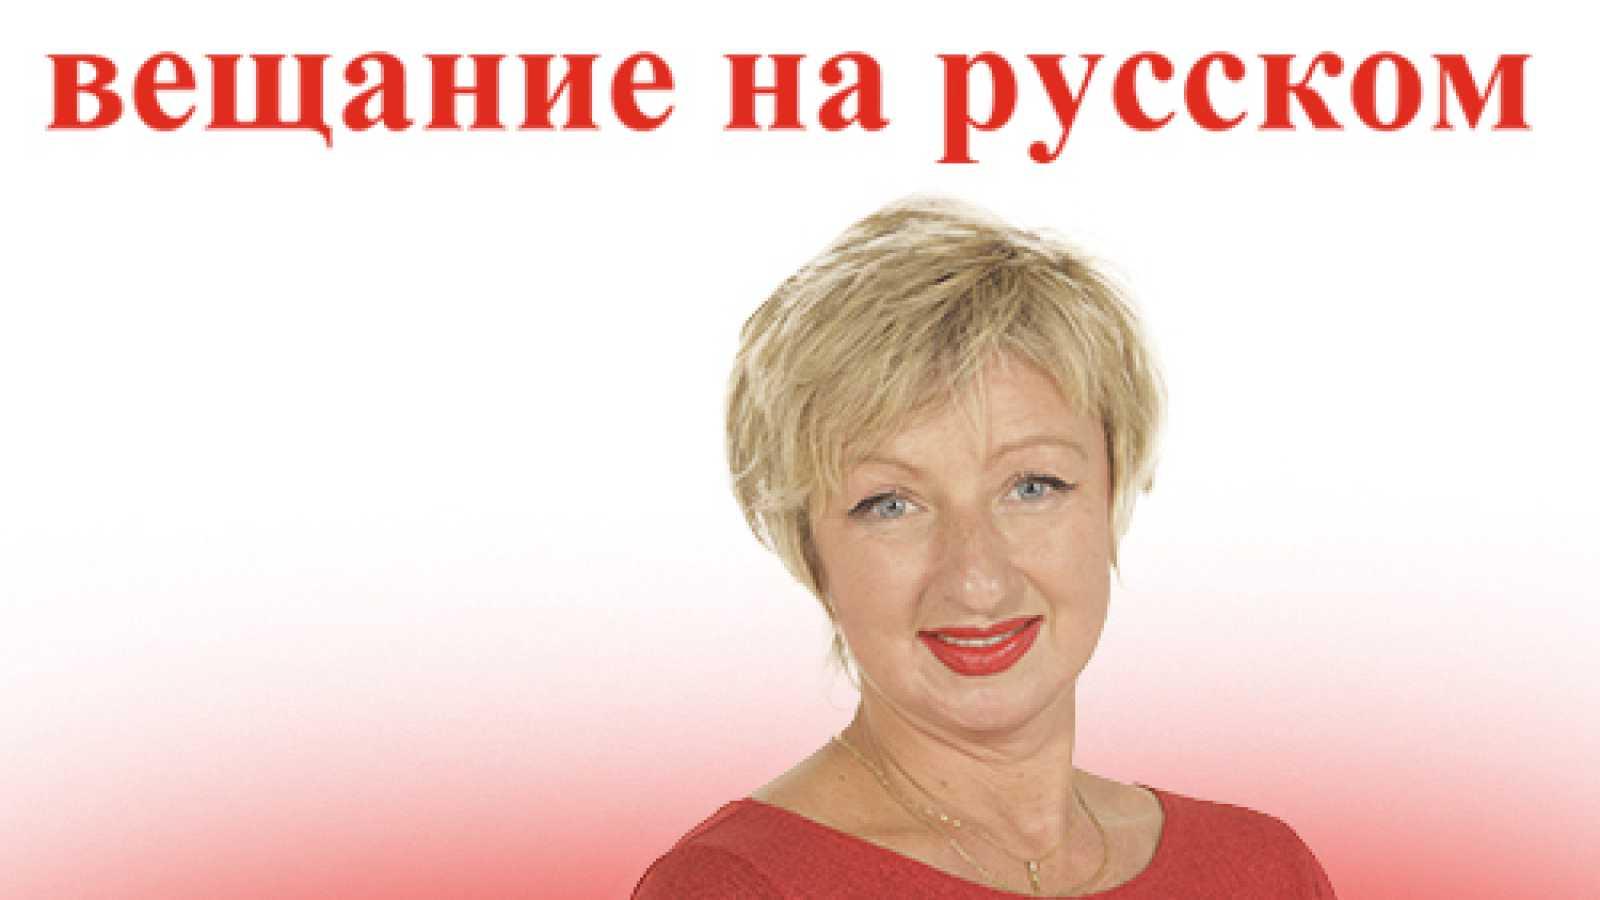 Emisión en ruso - Otkriváya sebiá zánovo - 19/04/21 - escuchar ahora